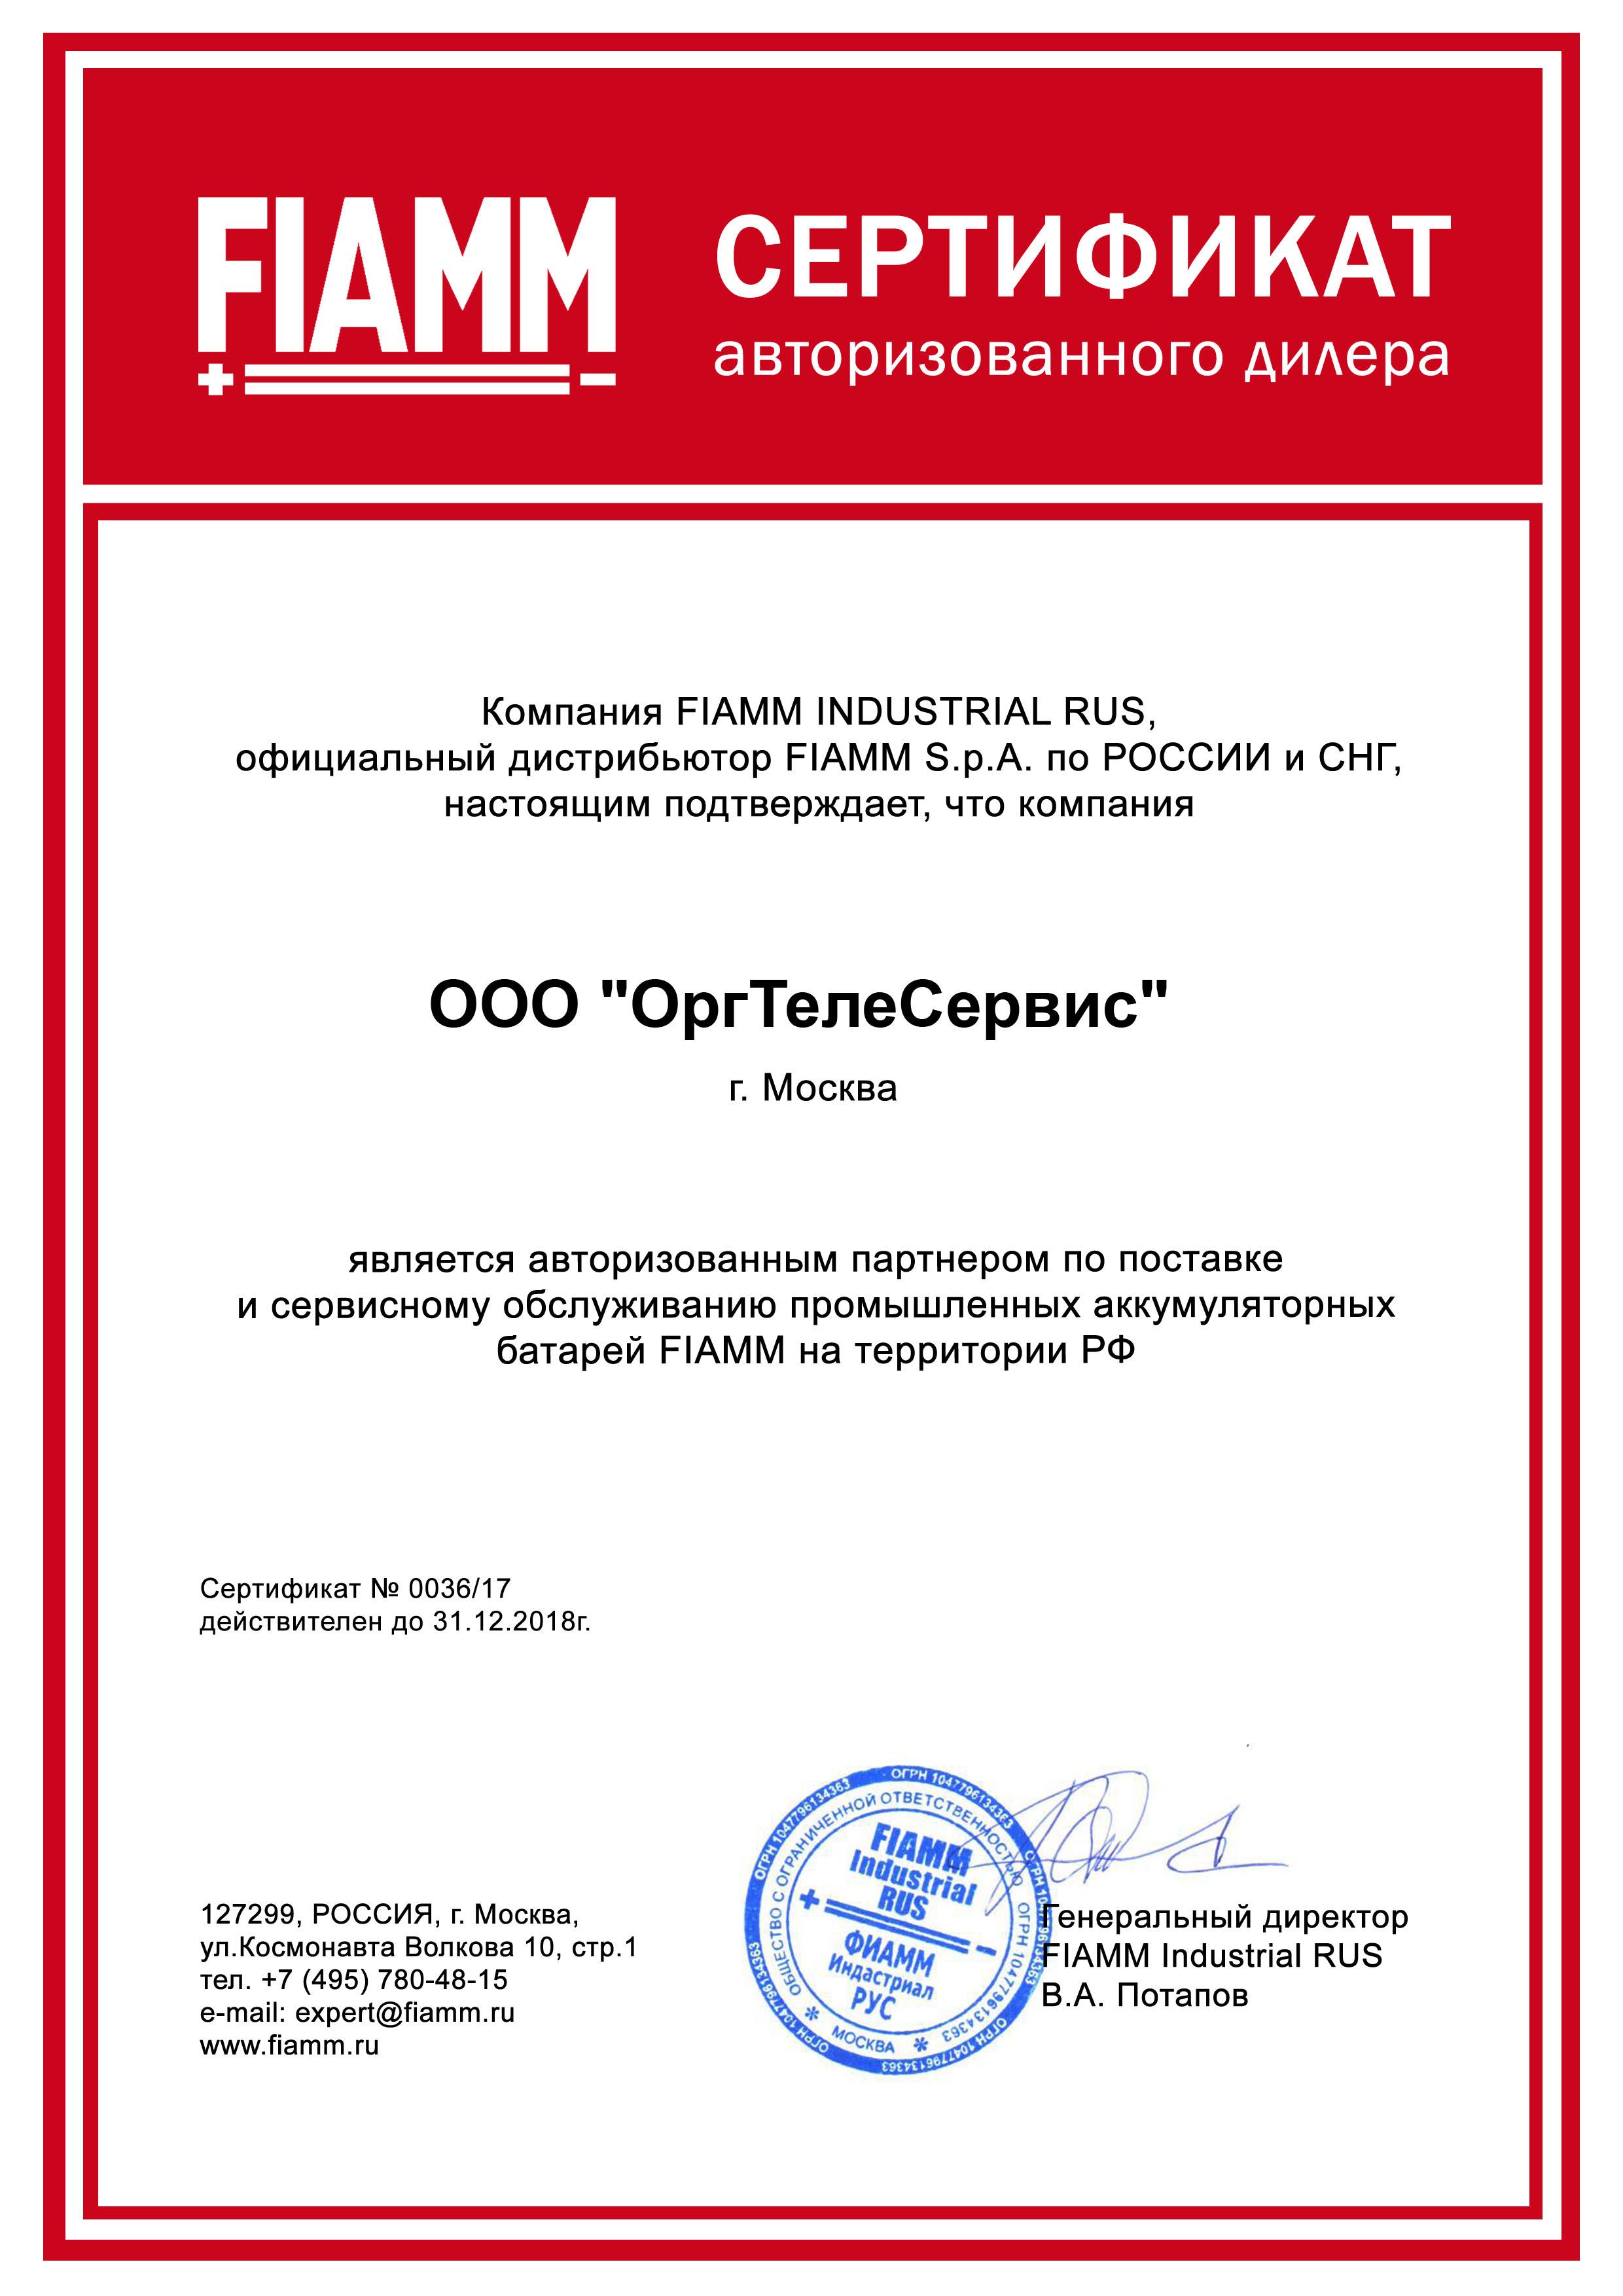 Сертификат_FIAMM